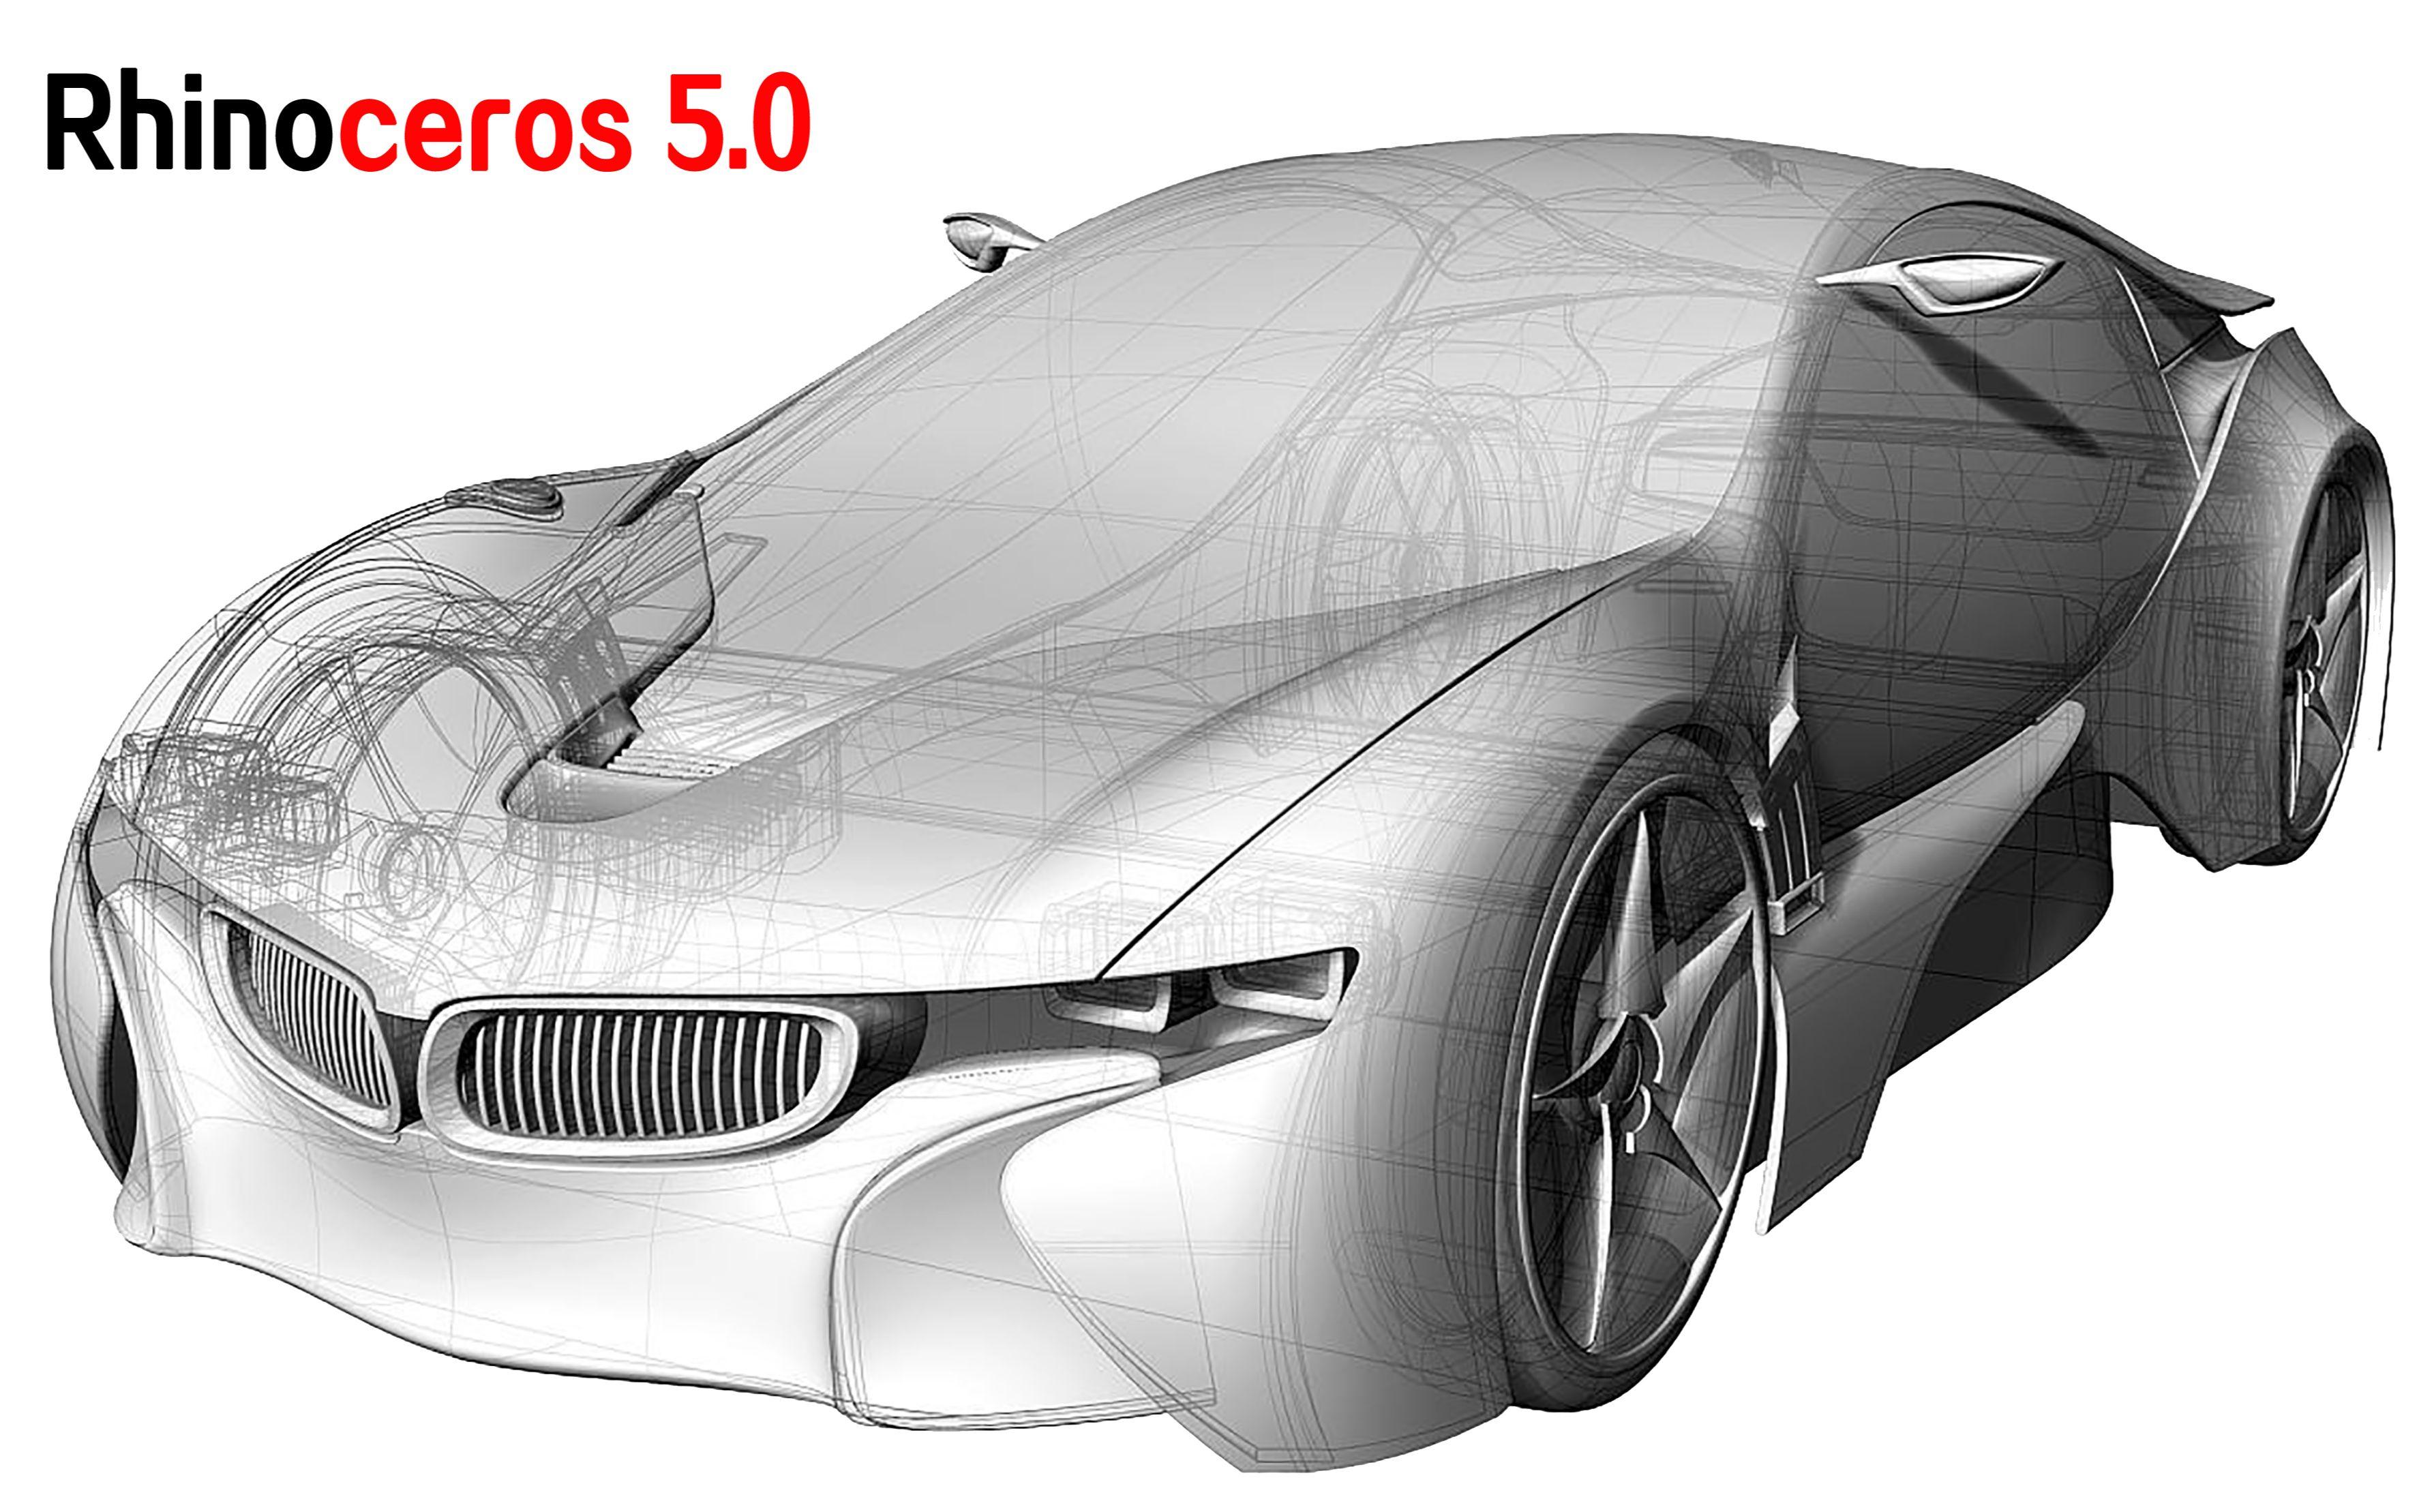 Rhino 5.0